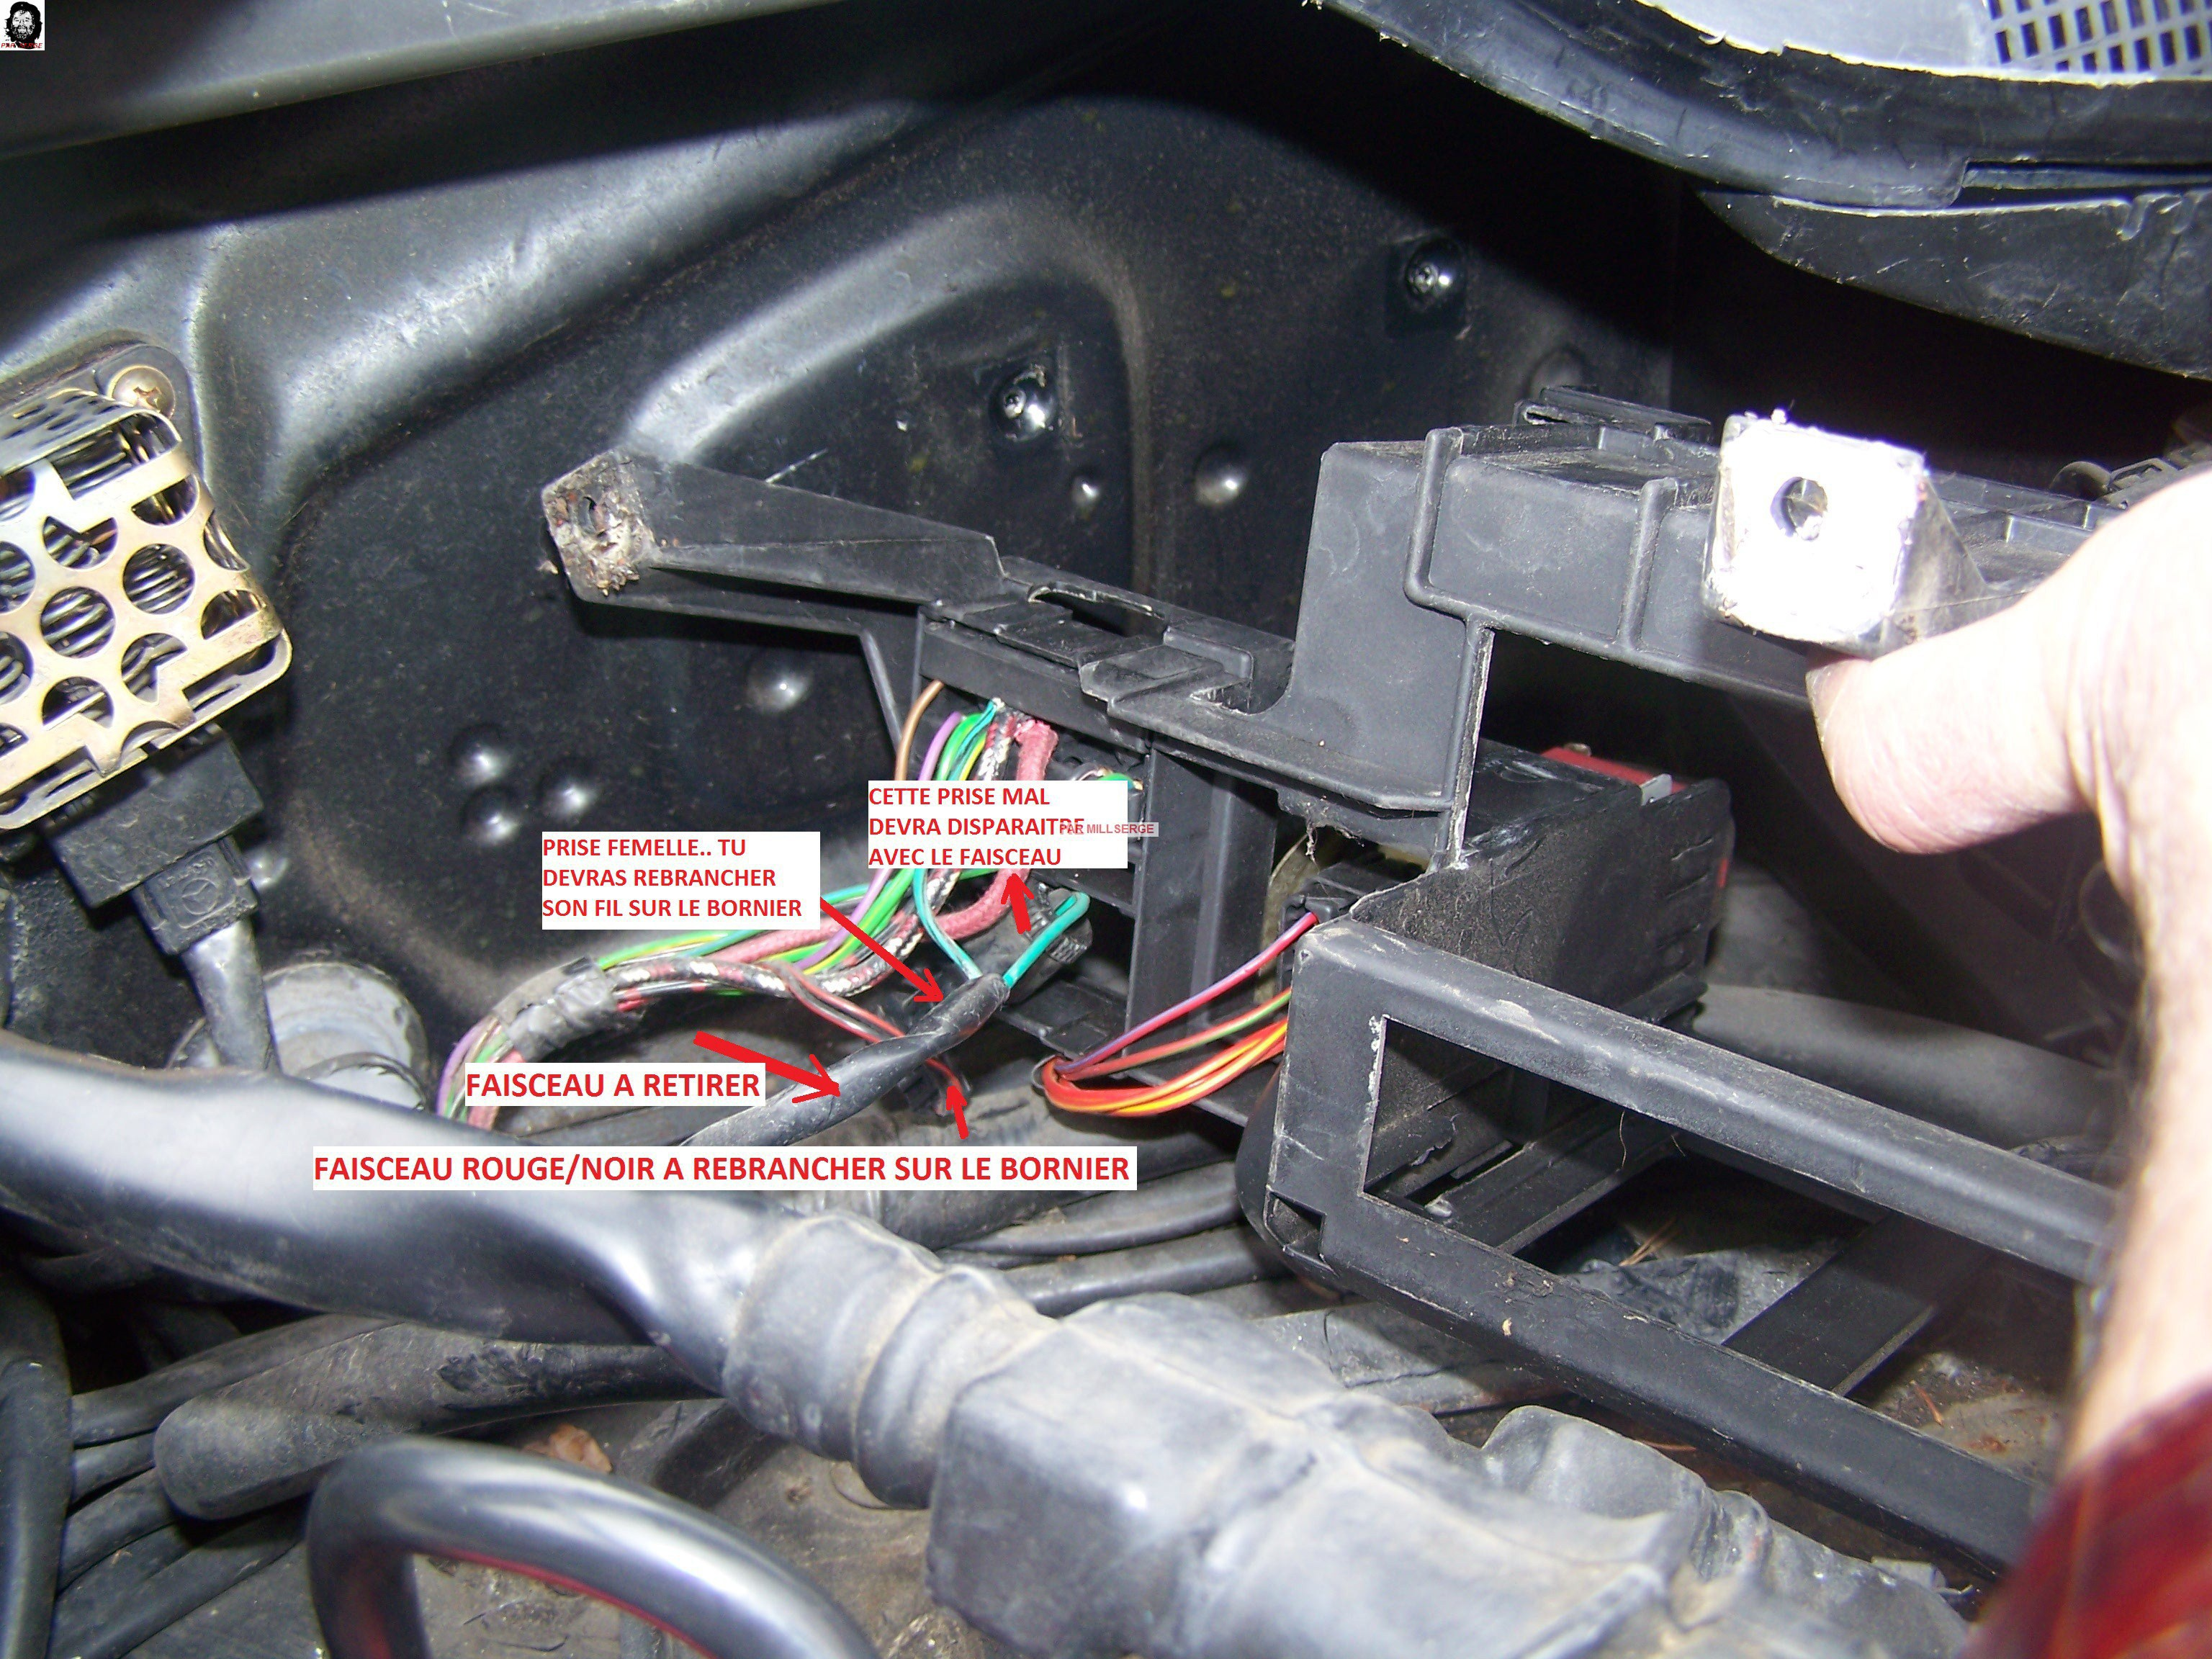 TUTO: Retrait d'une SERPI STAR MK 130-V 8410636Dmontagedusupportdesborniers